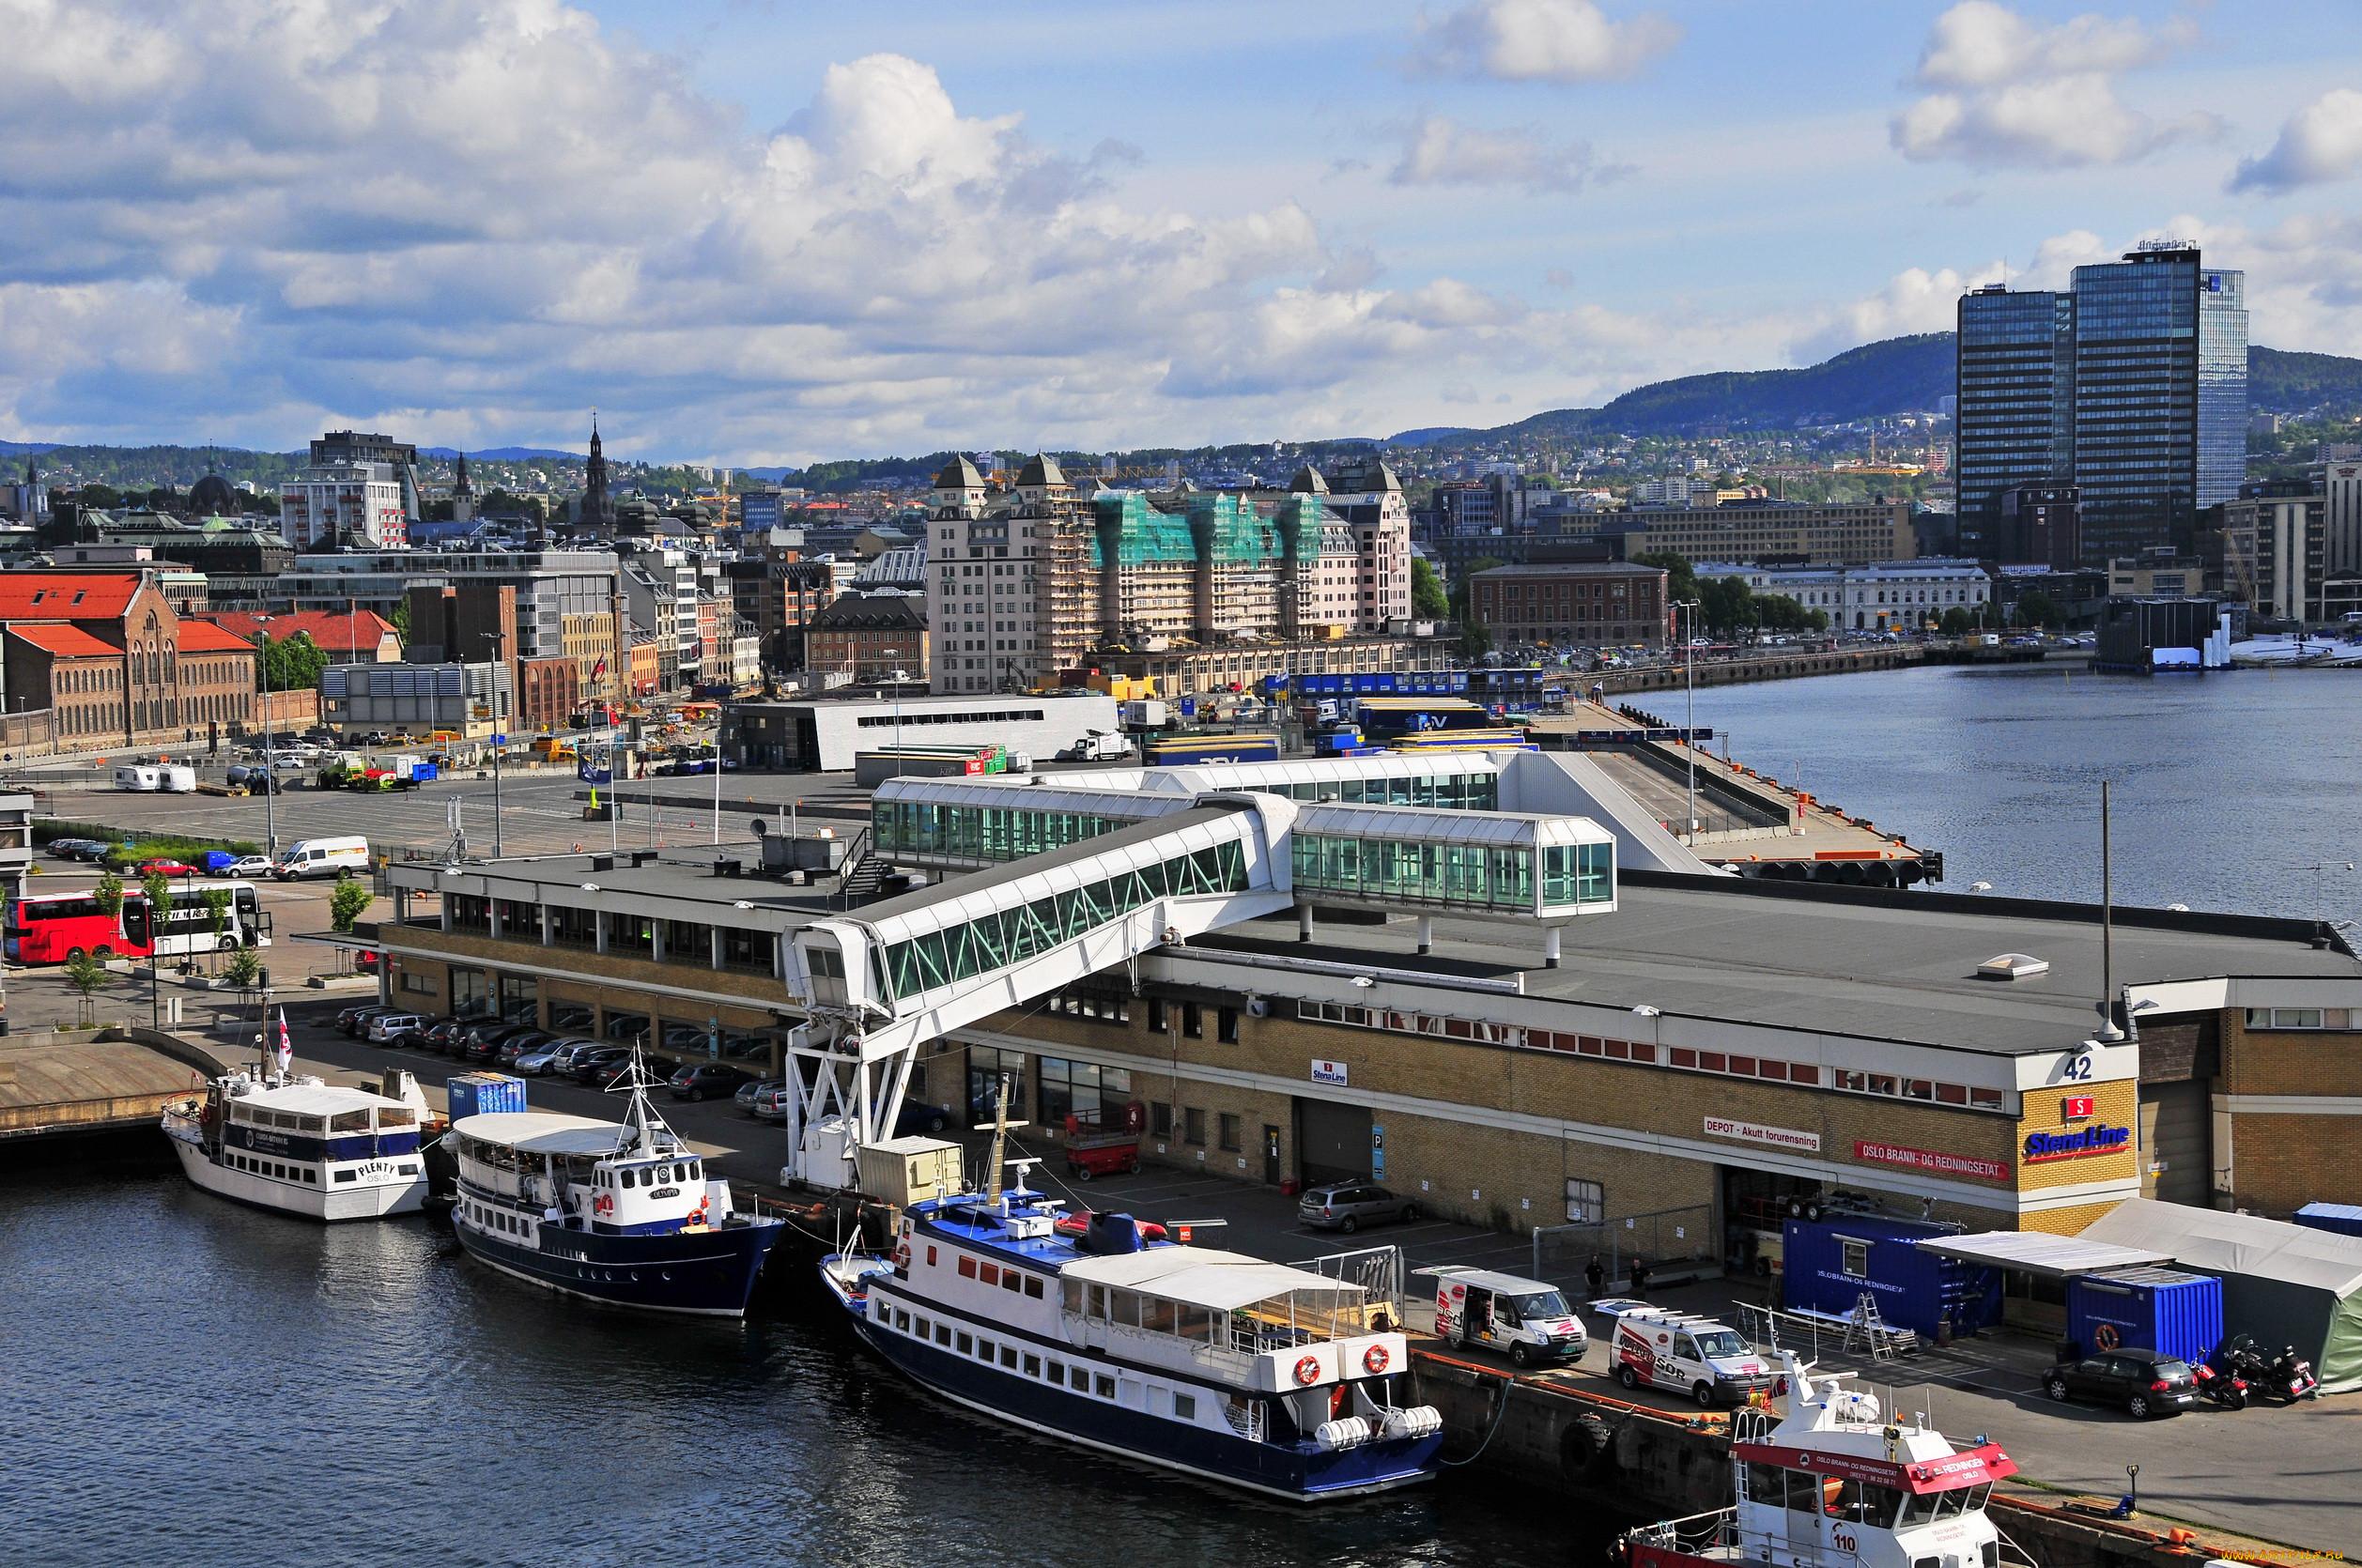 презентация город осло столица норвегии фото известной актрисы, последние